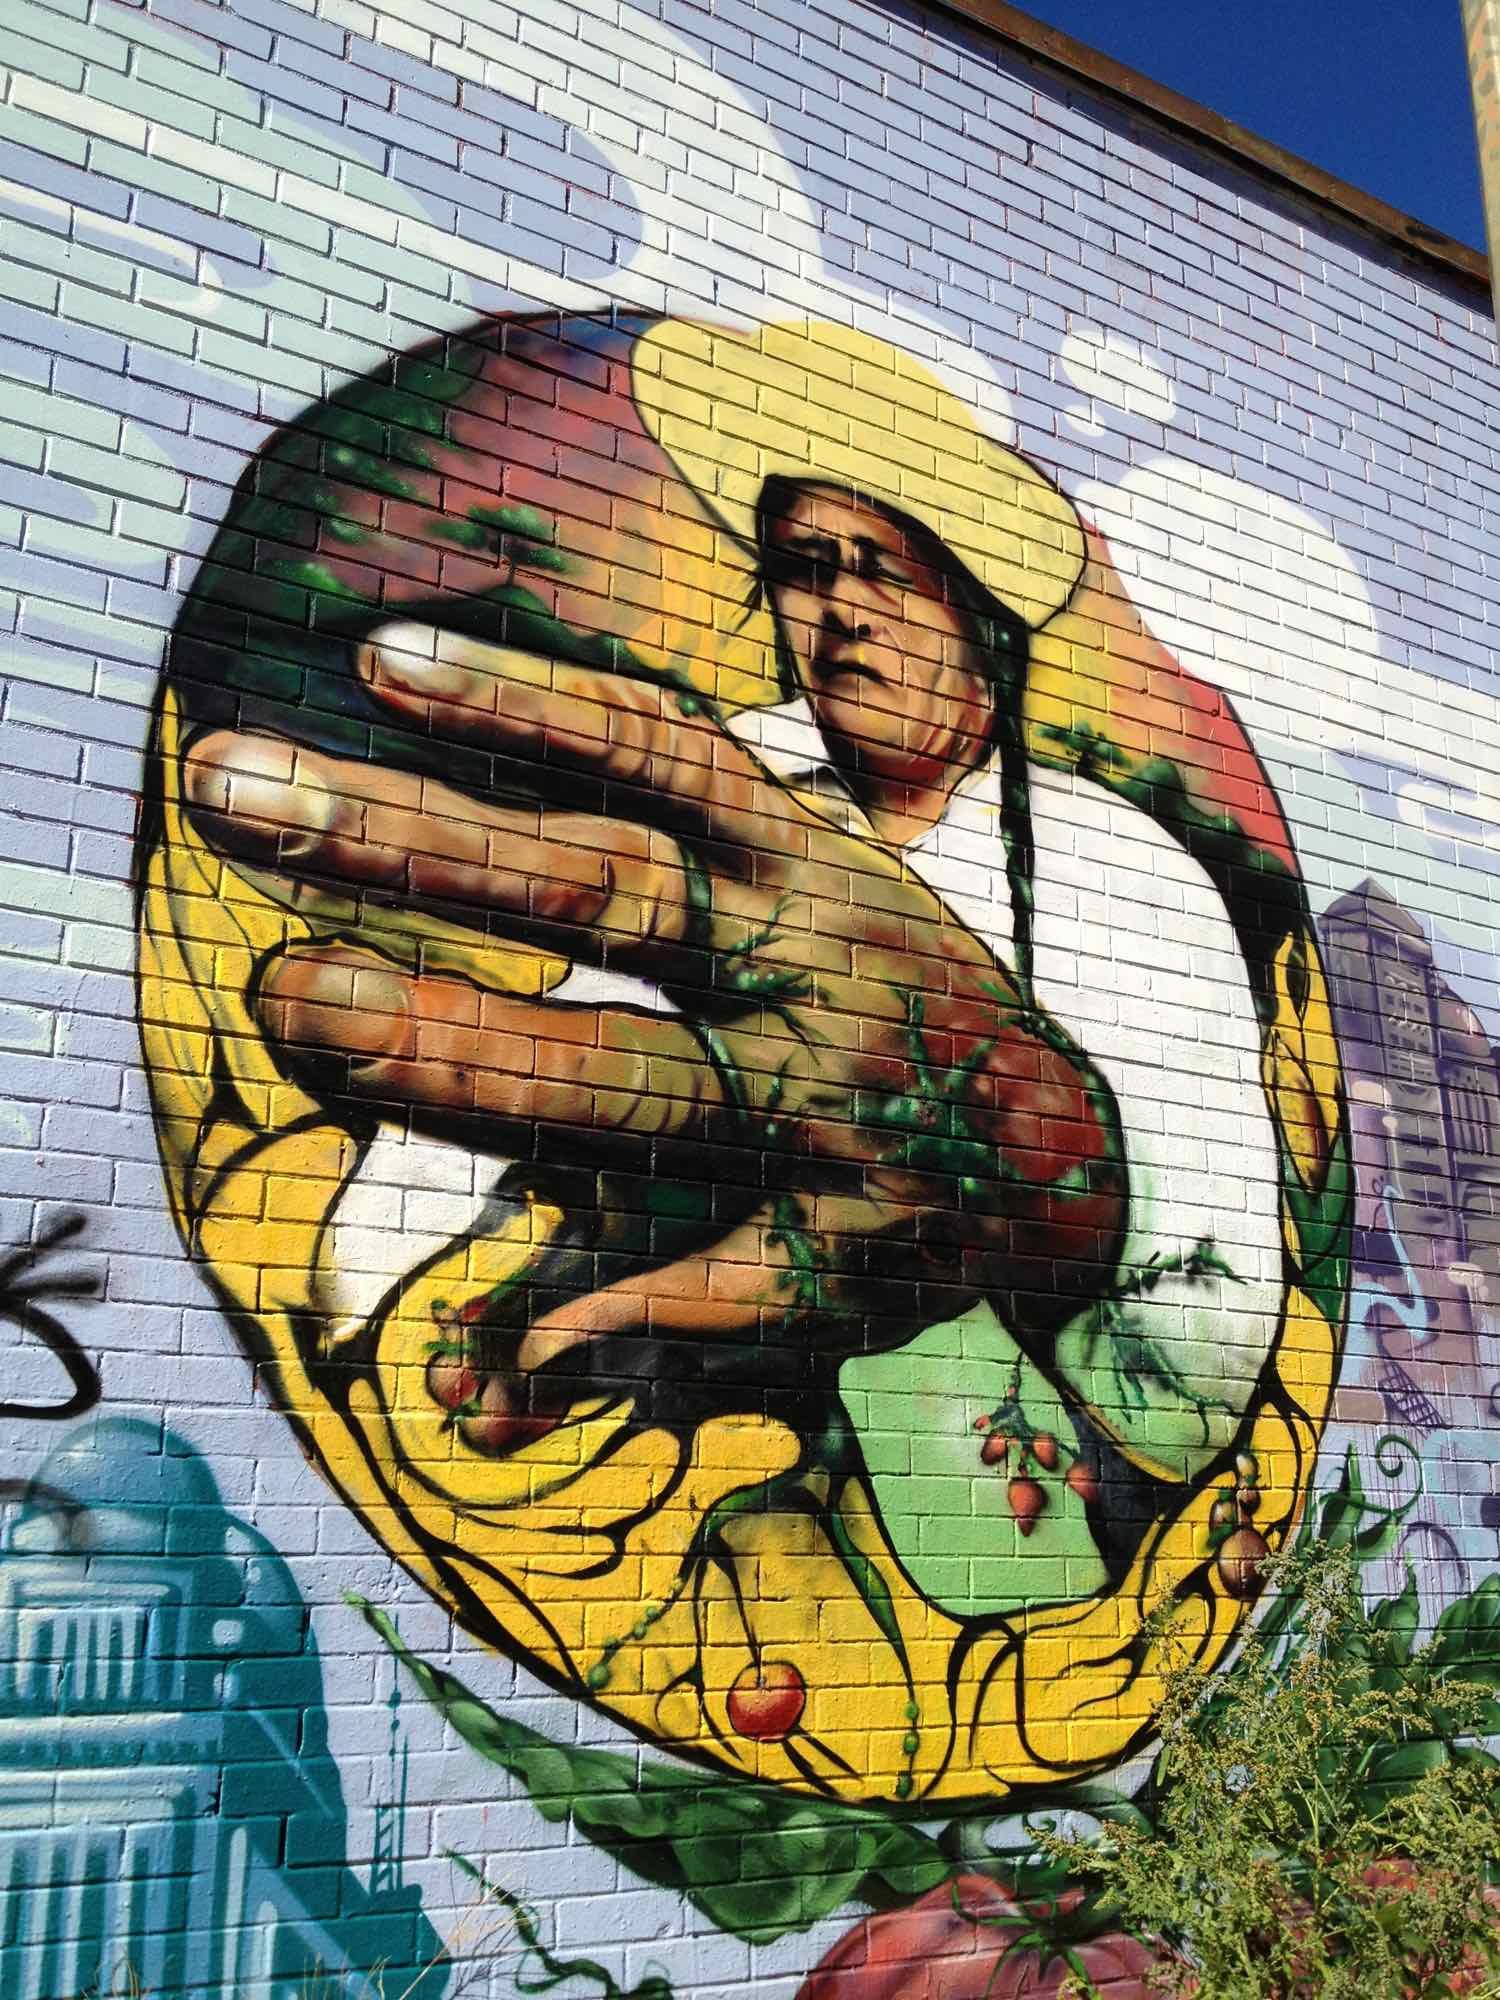 The_Walls_Of_Montreal-Ezra_Soiferman - 10.jpg